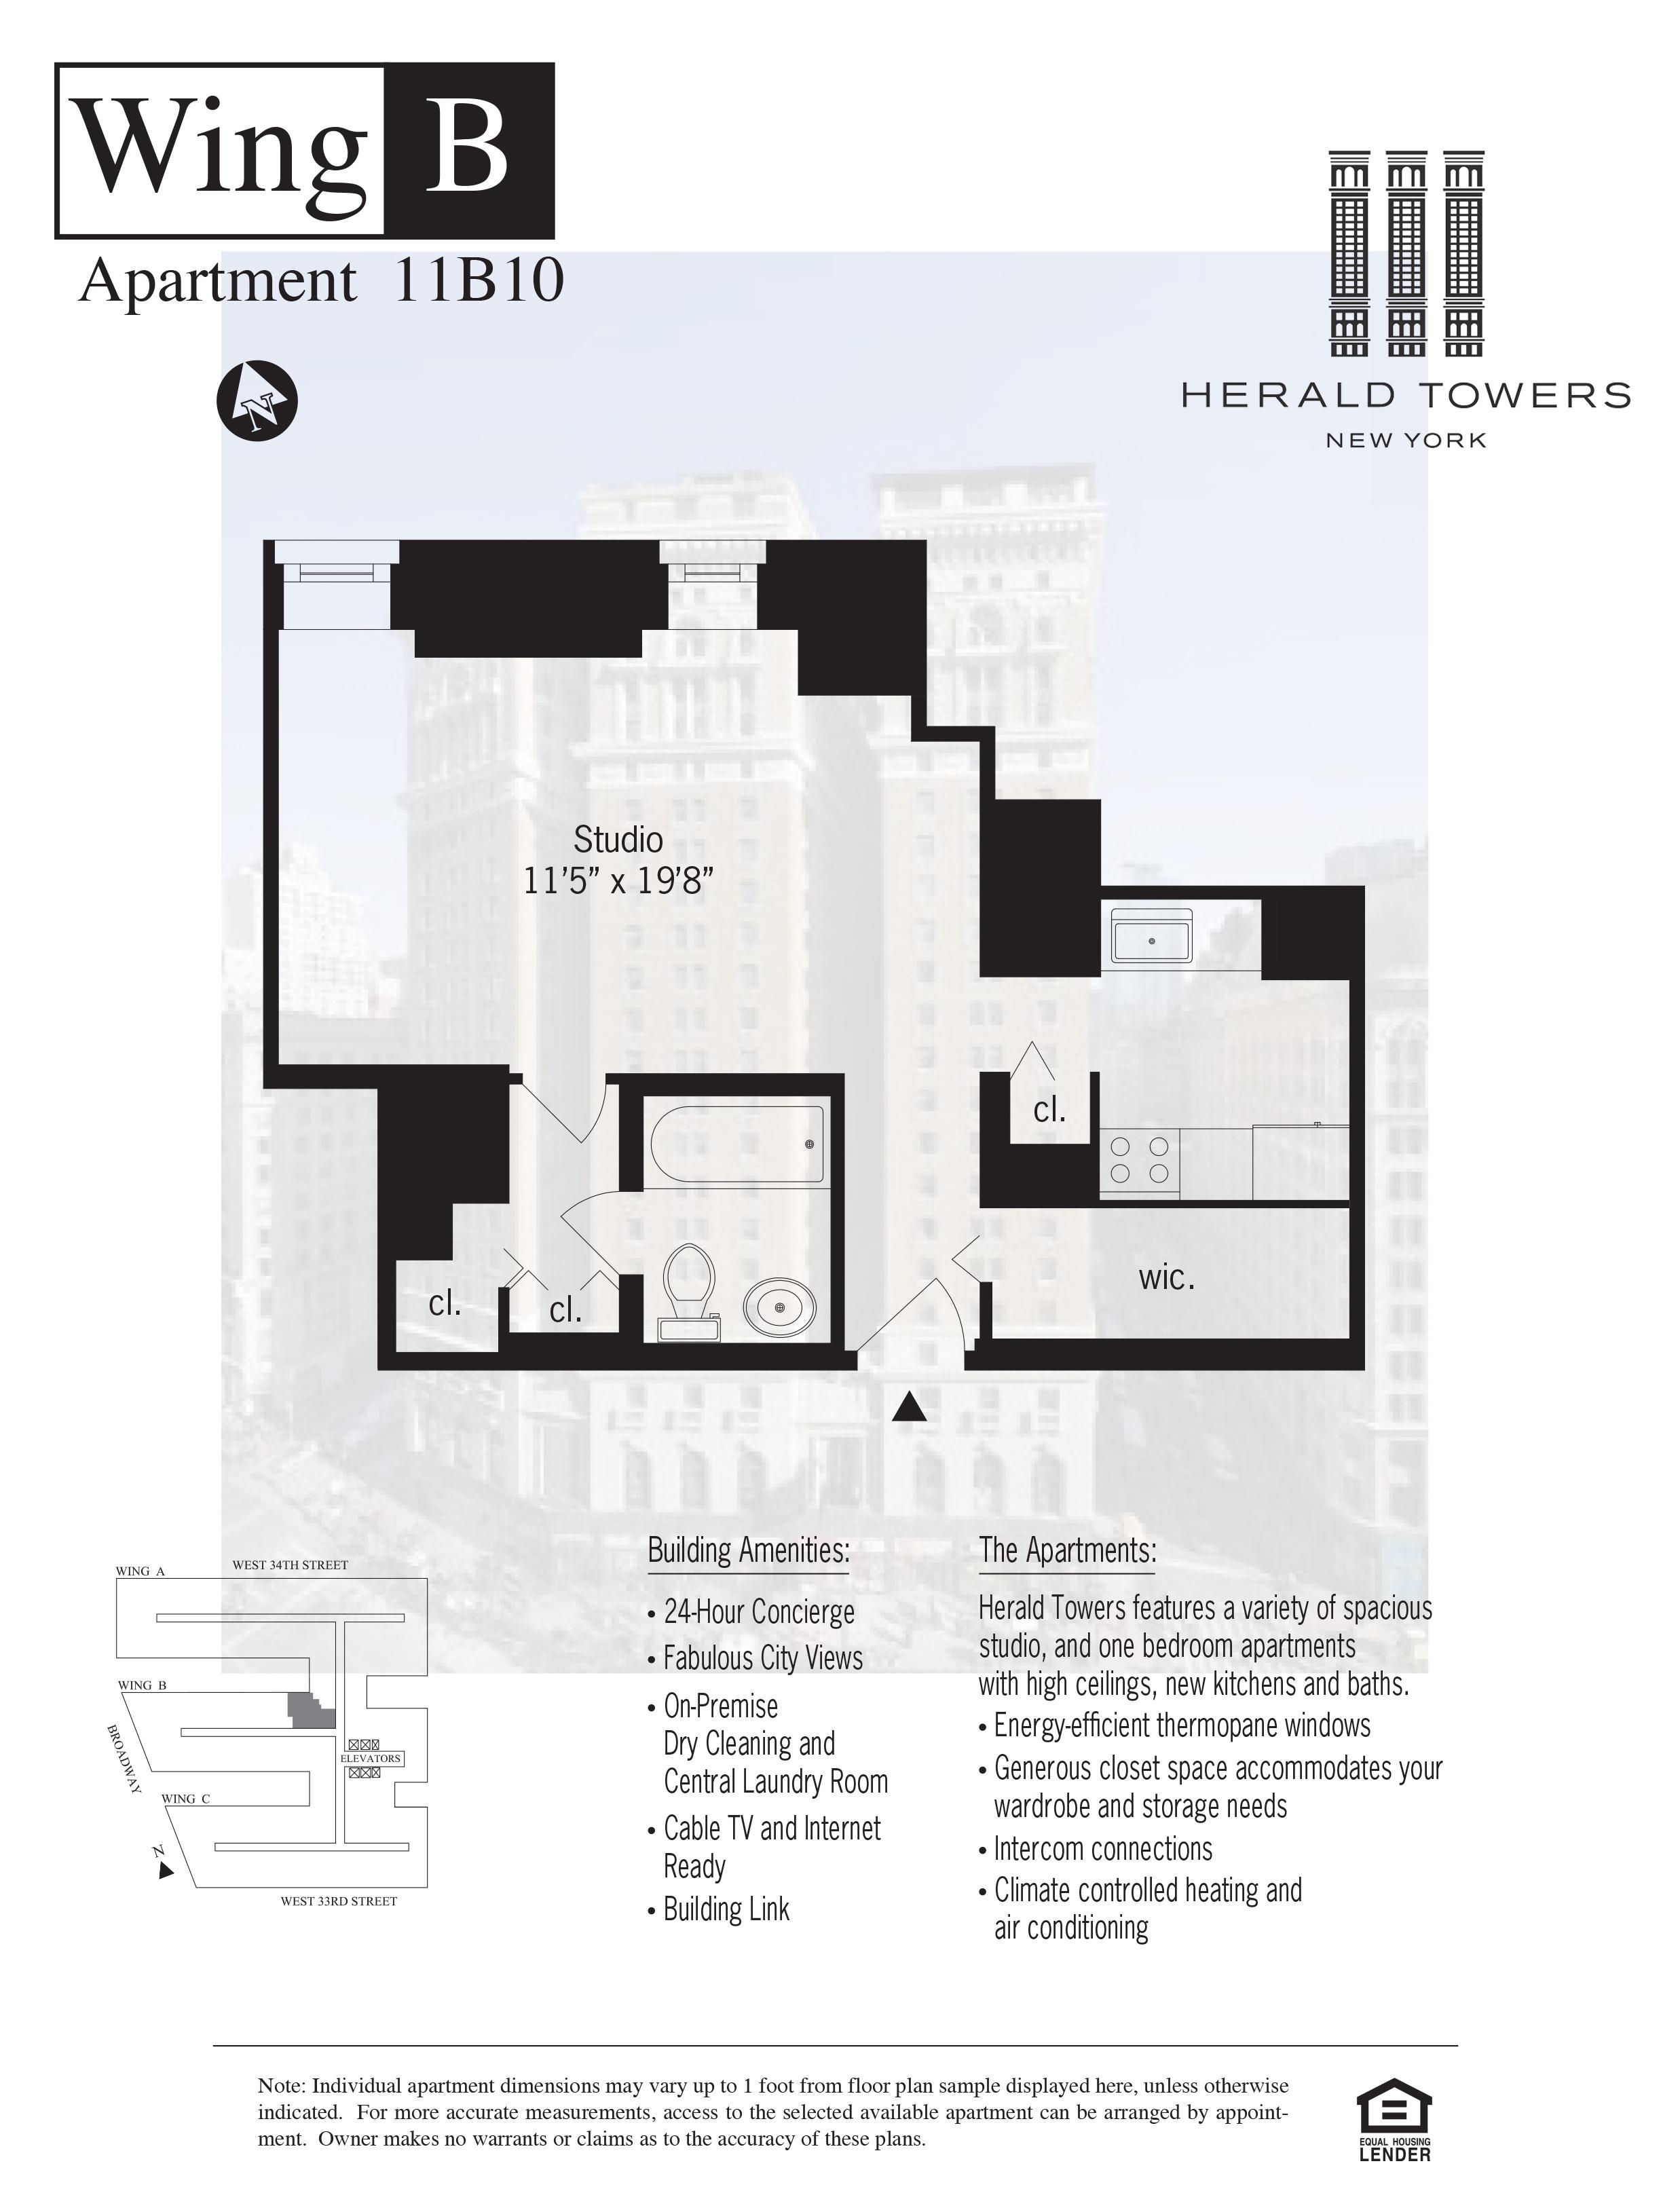 Floor plan for 11B10